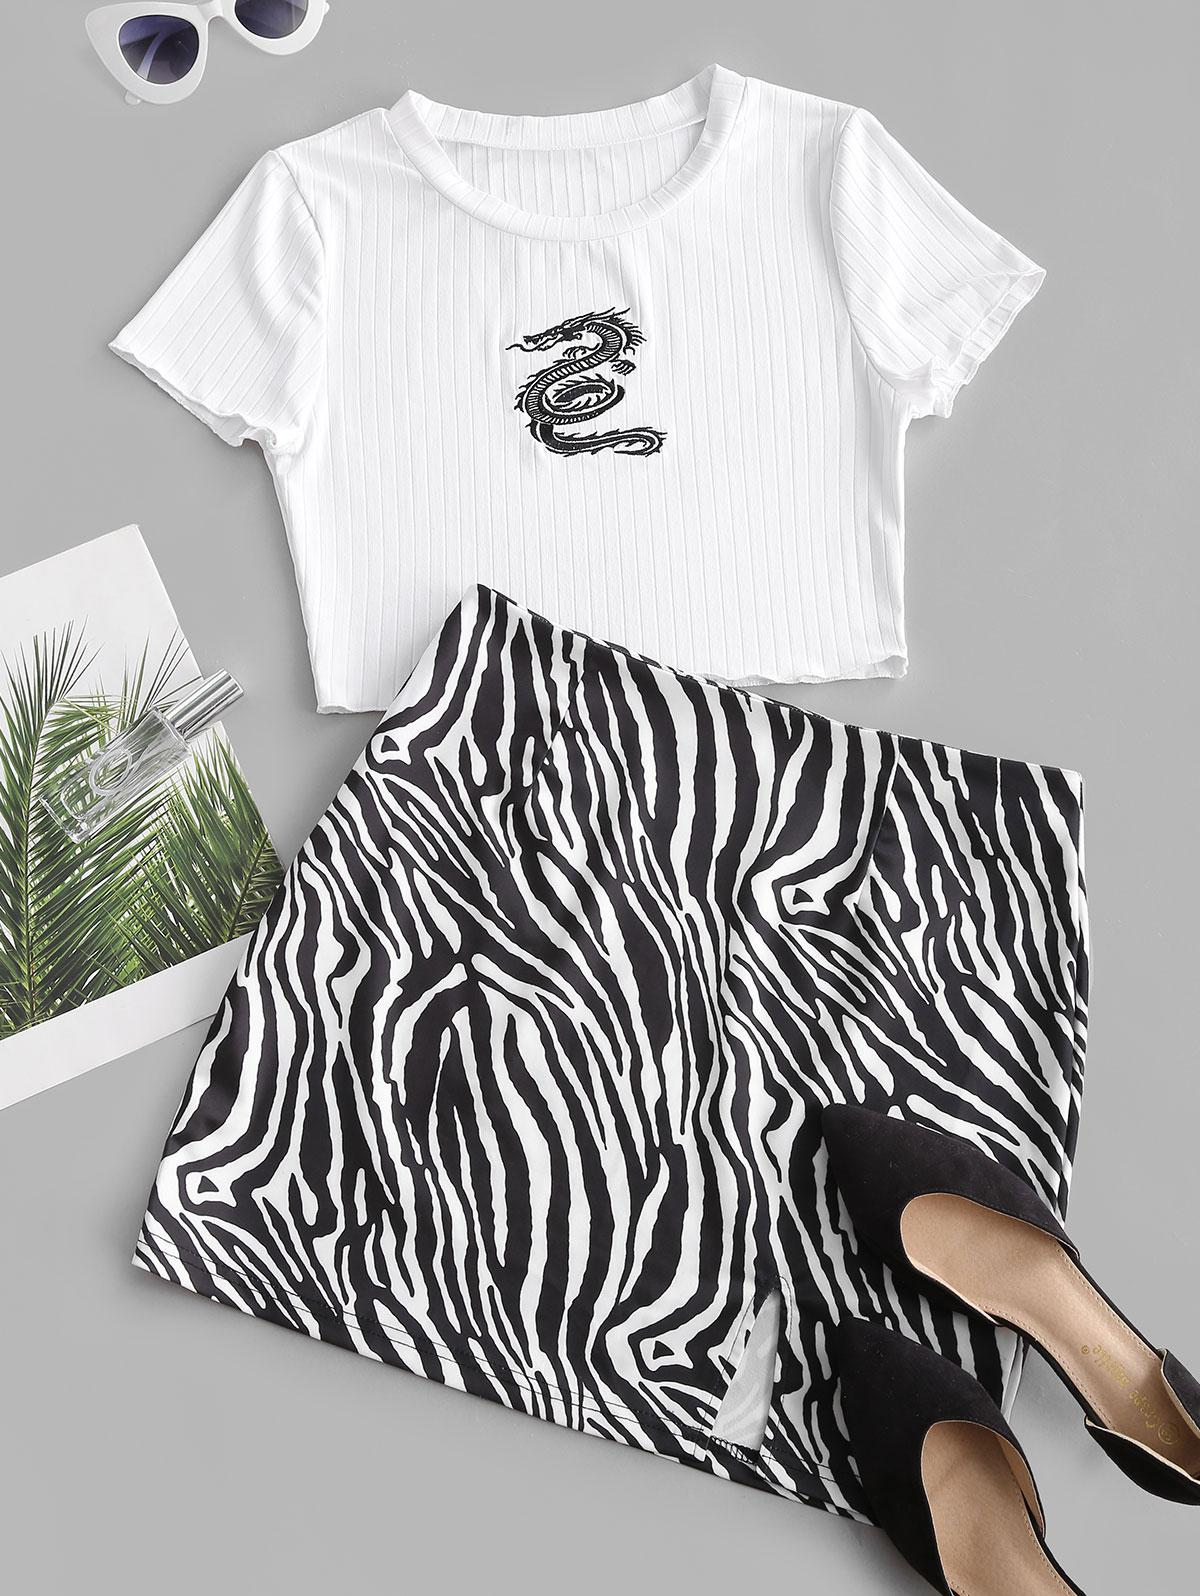 ZAFUL Dragon Embroidered Zebra Print Slit Skirt Set